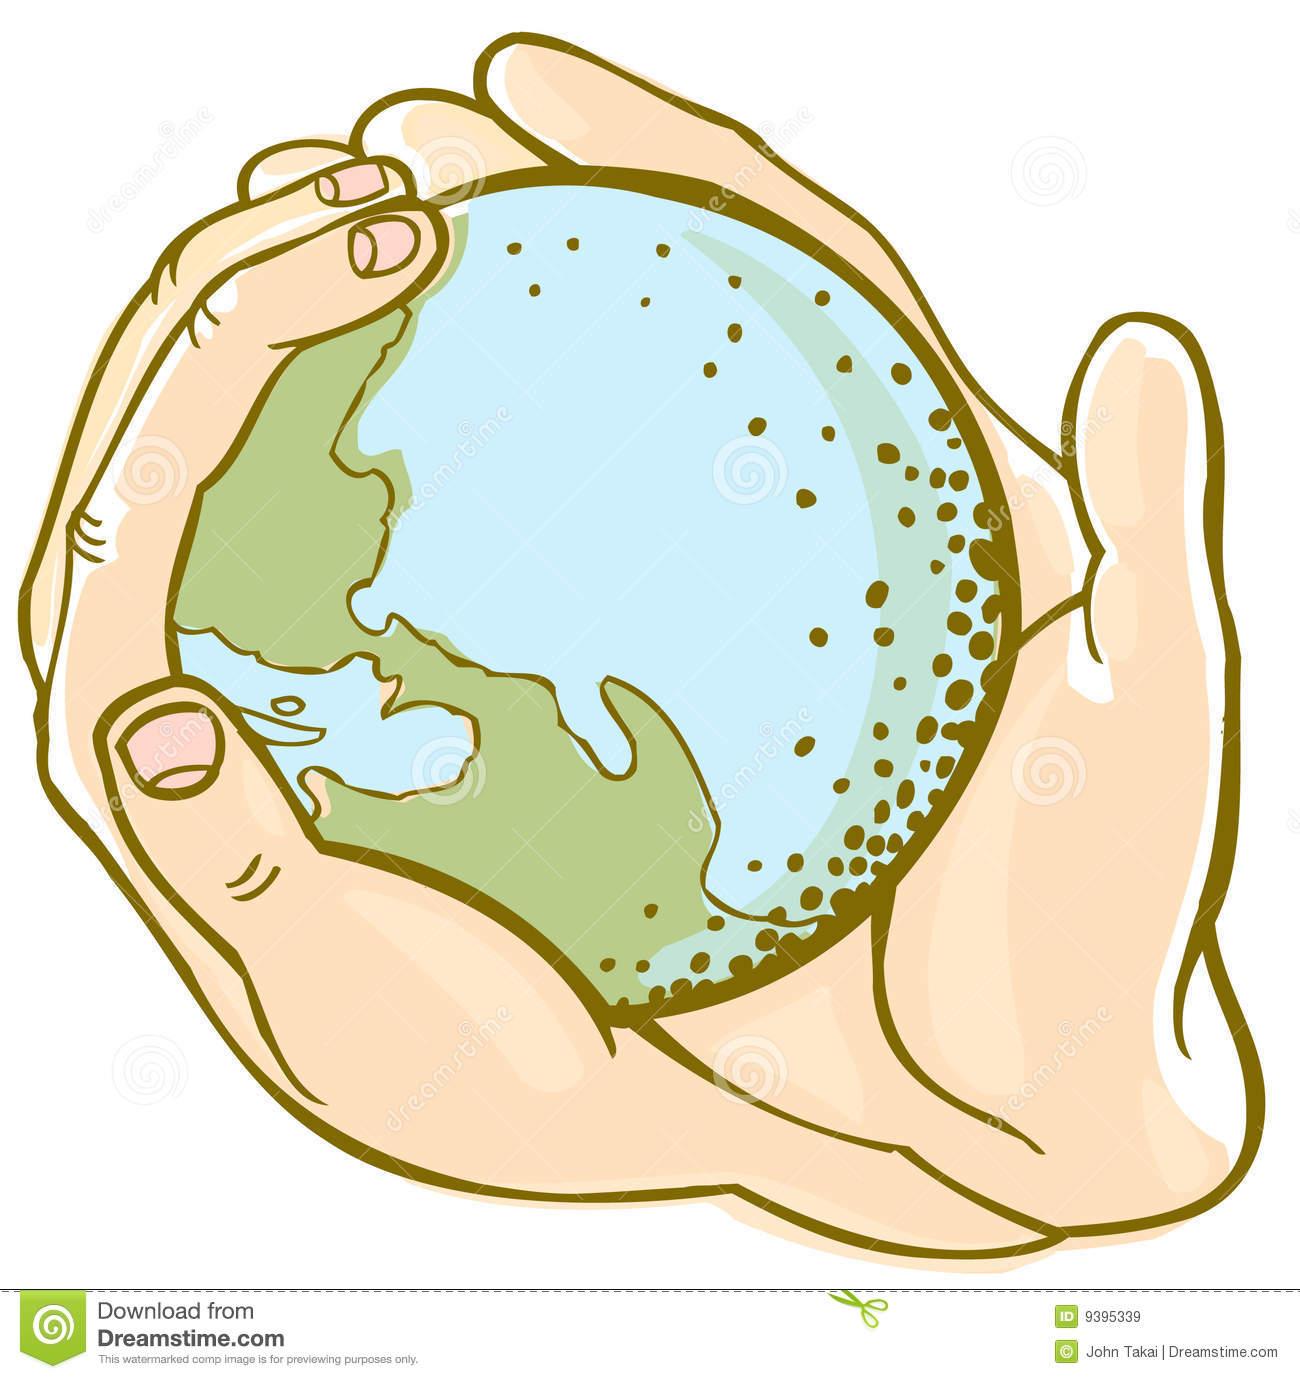 Earth hands stock vector. Illustration of nurture, decoration.